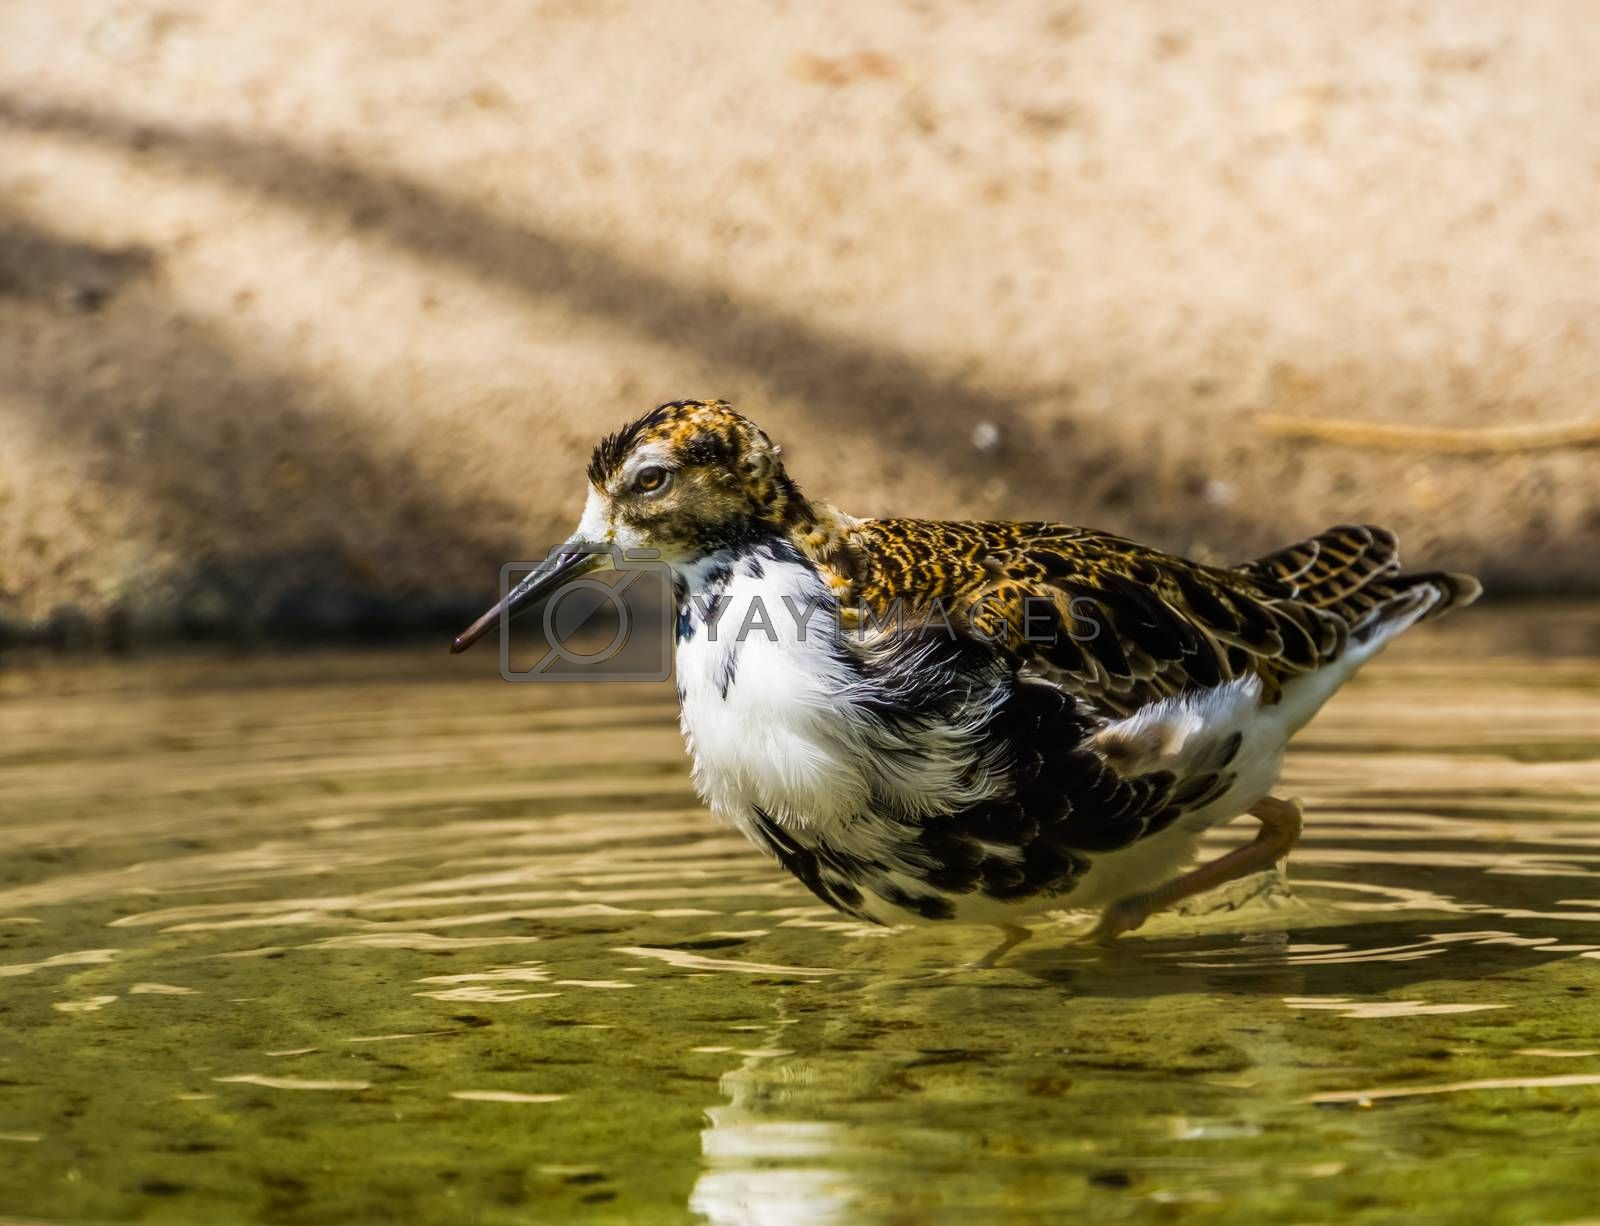 closeup portrait of a female ruff walking through the water, Wading bird from Eurasia